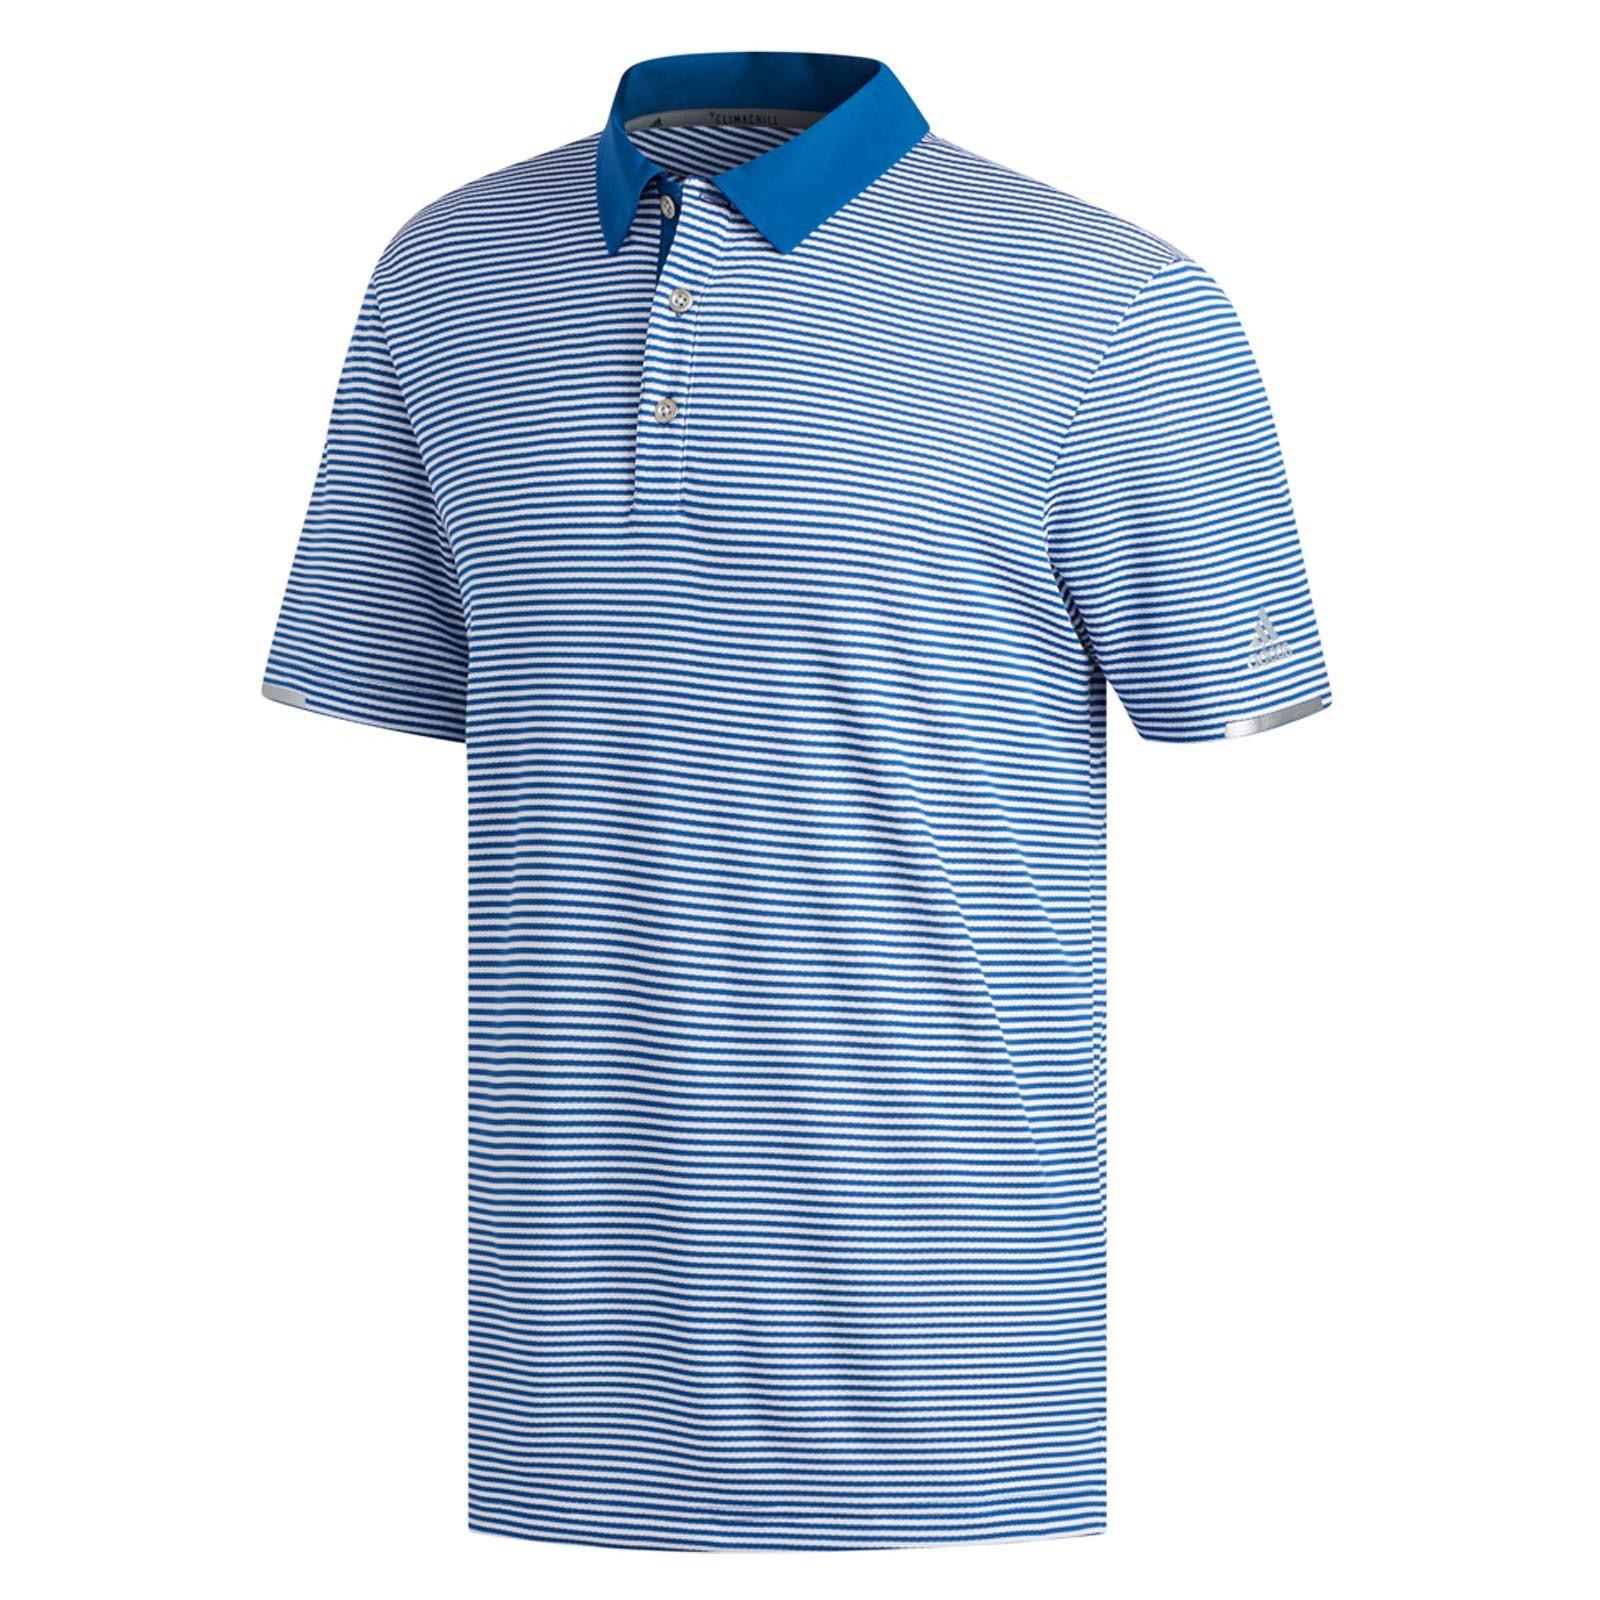 adidas Climachill Tonal Stripe Polo Shirts